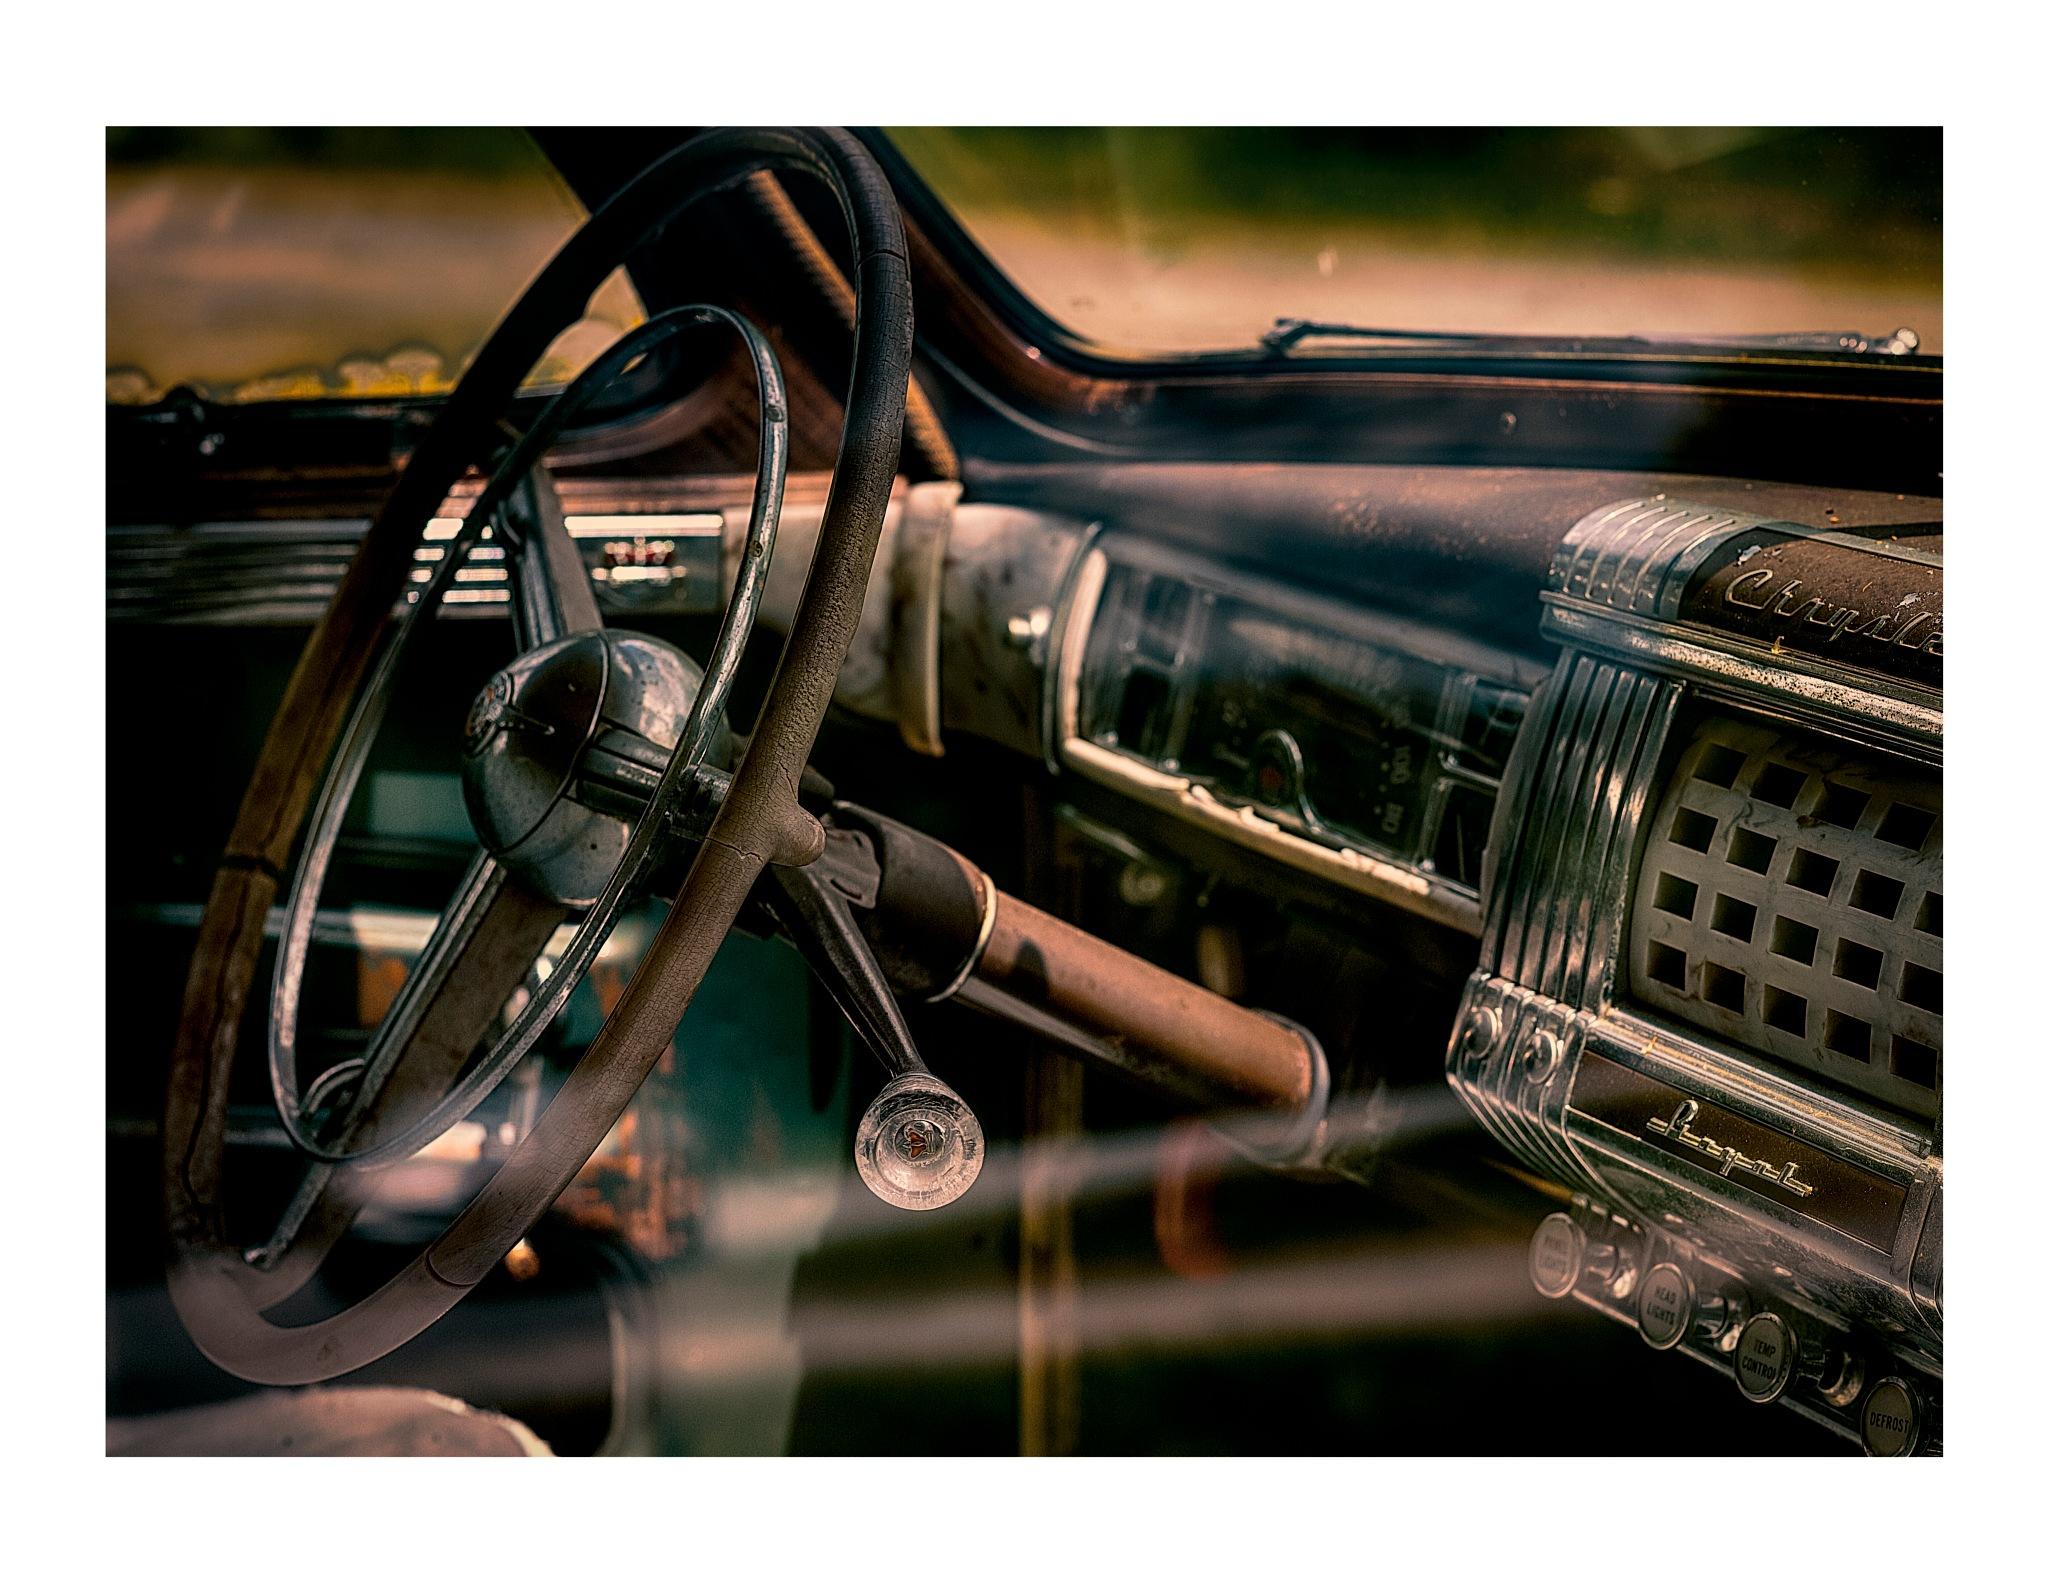 Sterring Wheel by jhulton